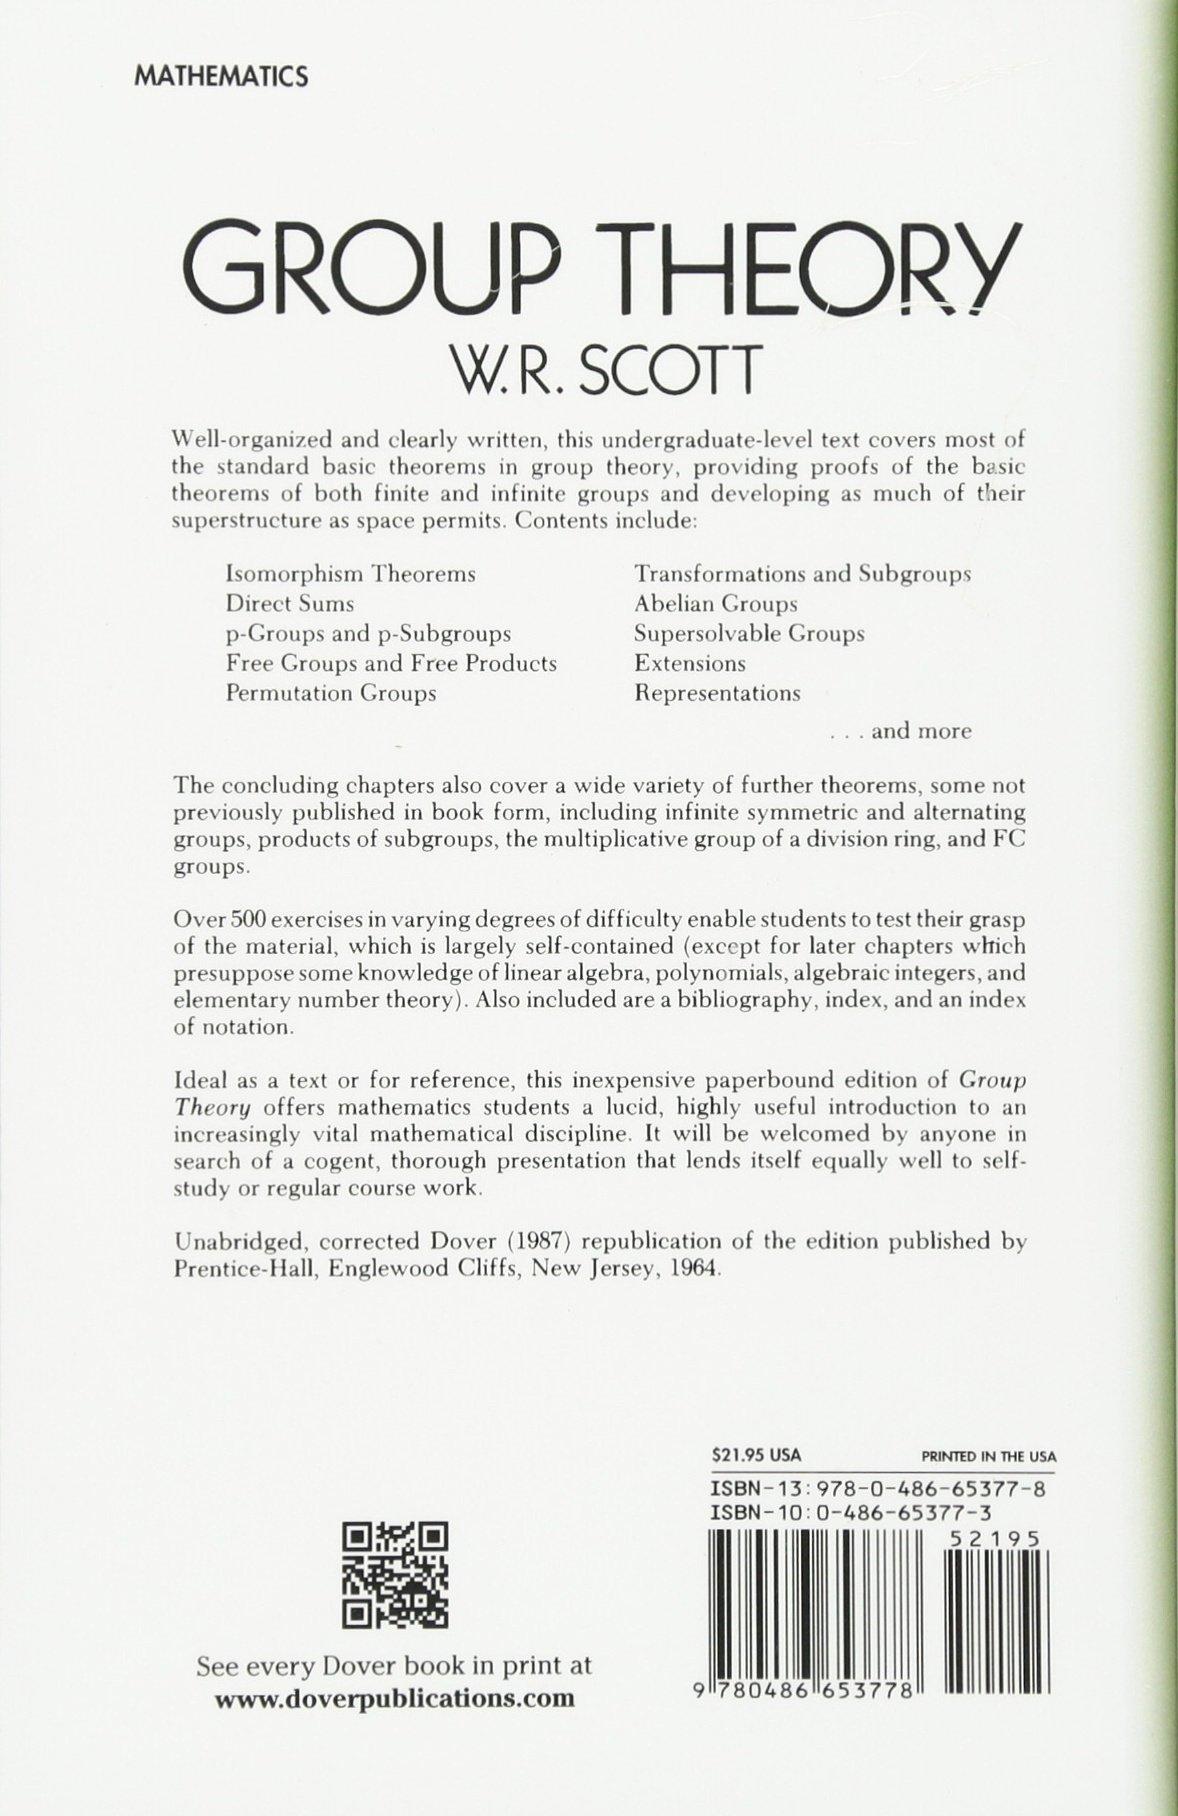 Group Theory (Dover Books on Mathematics): W. R. Scott ...